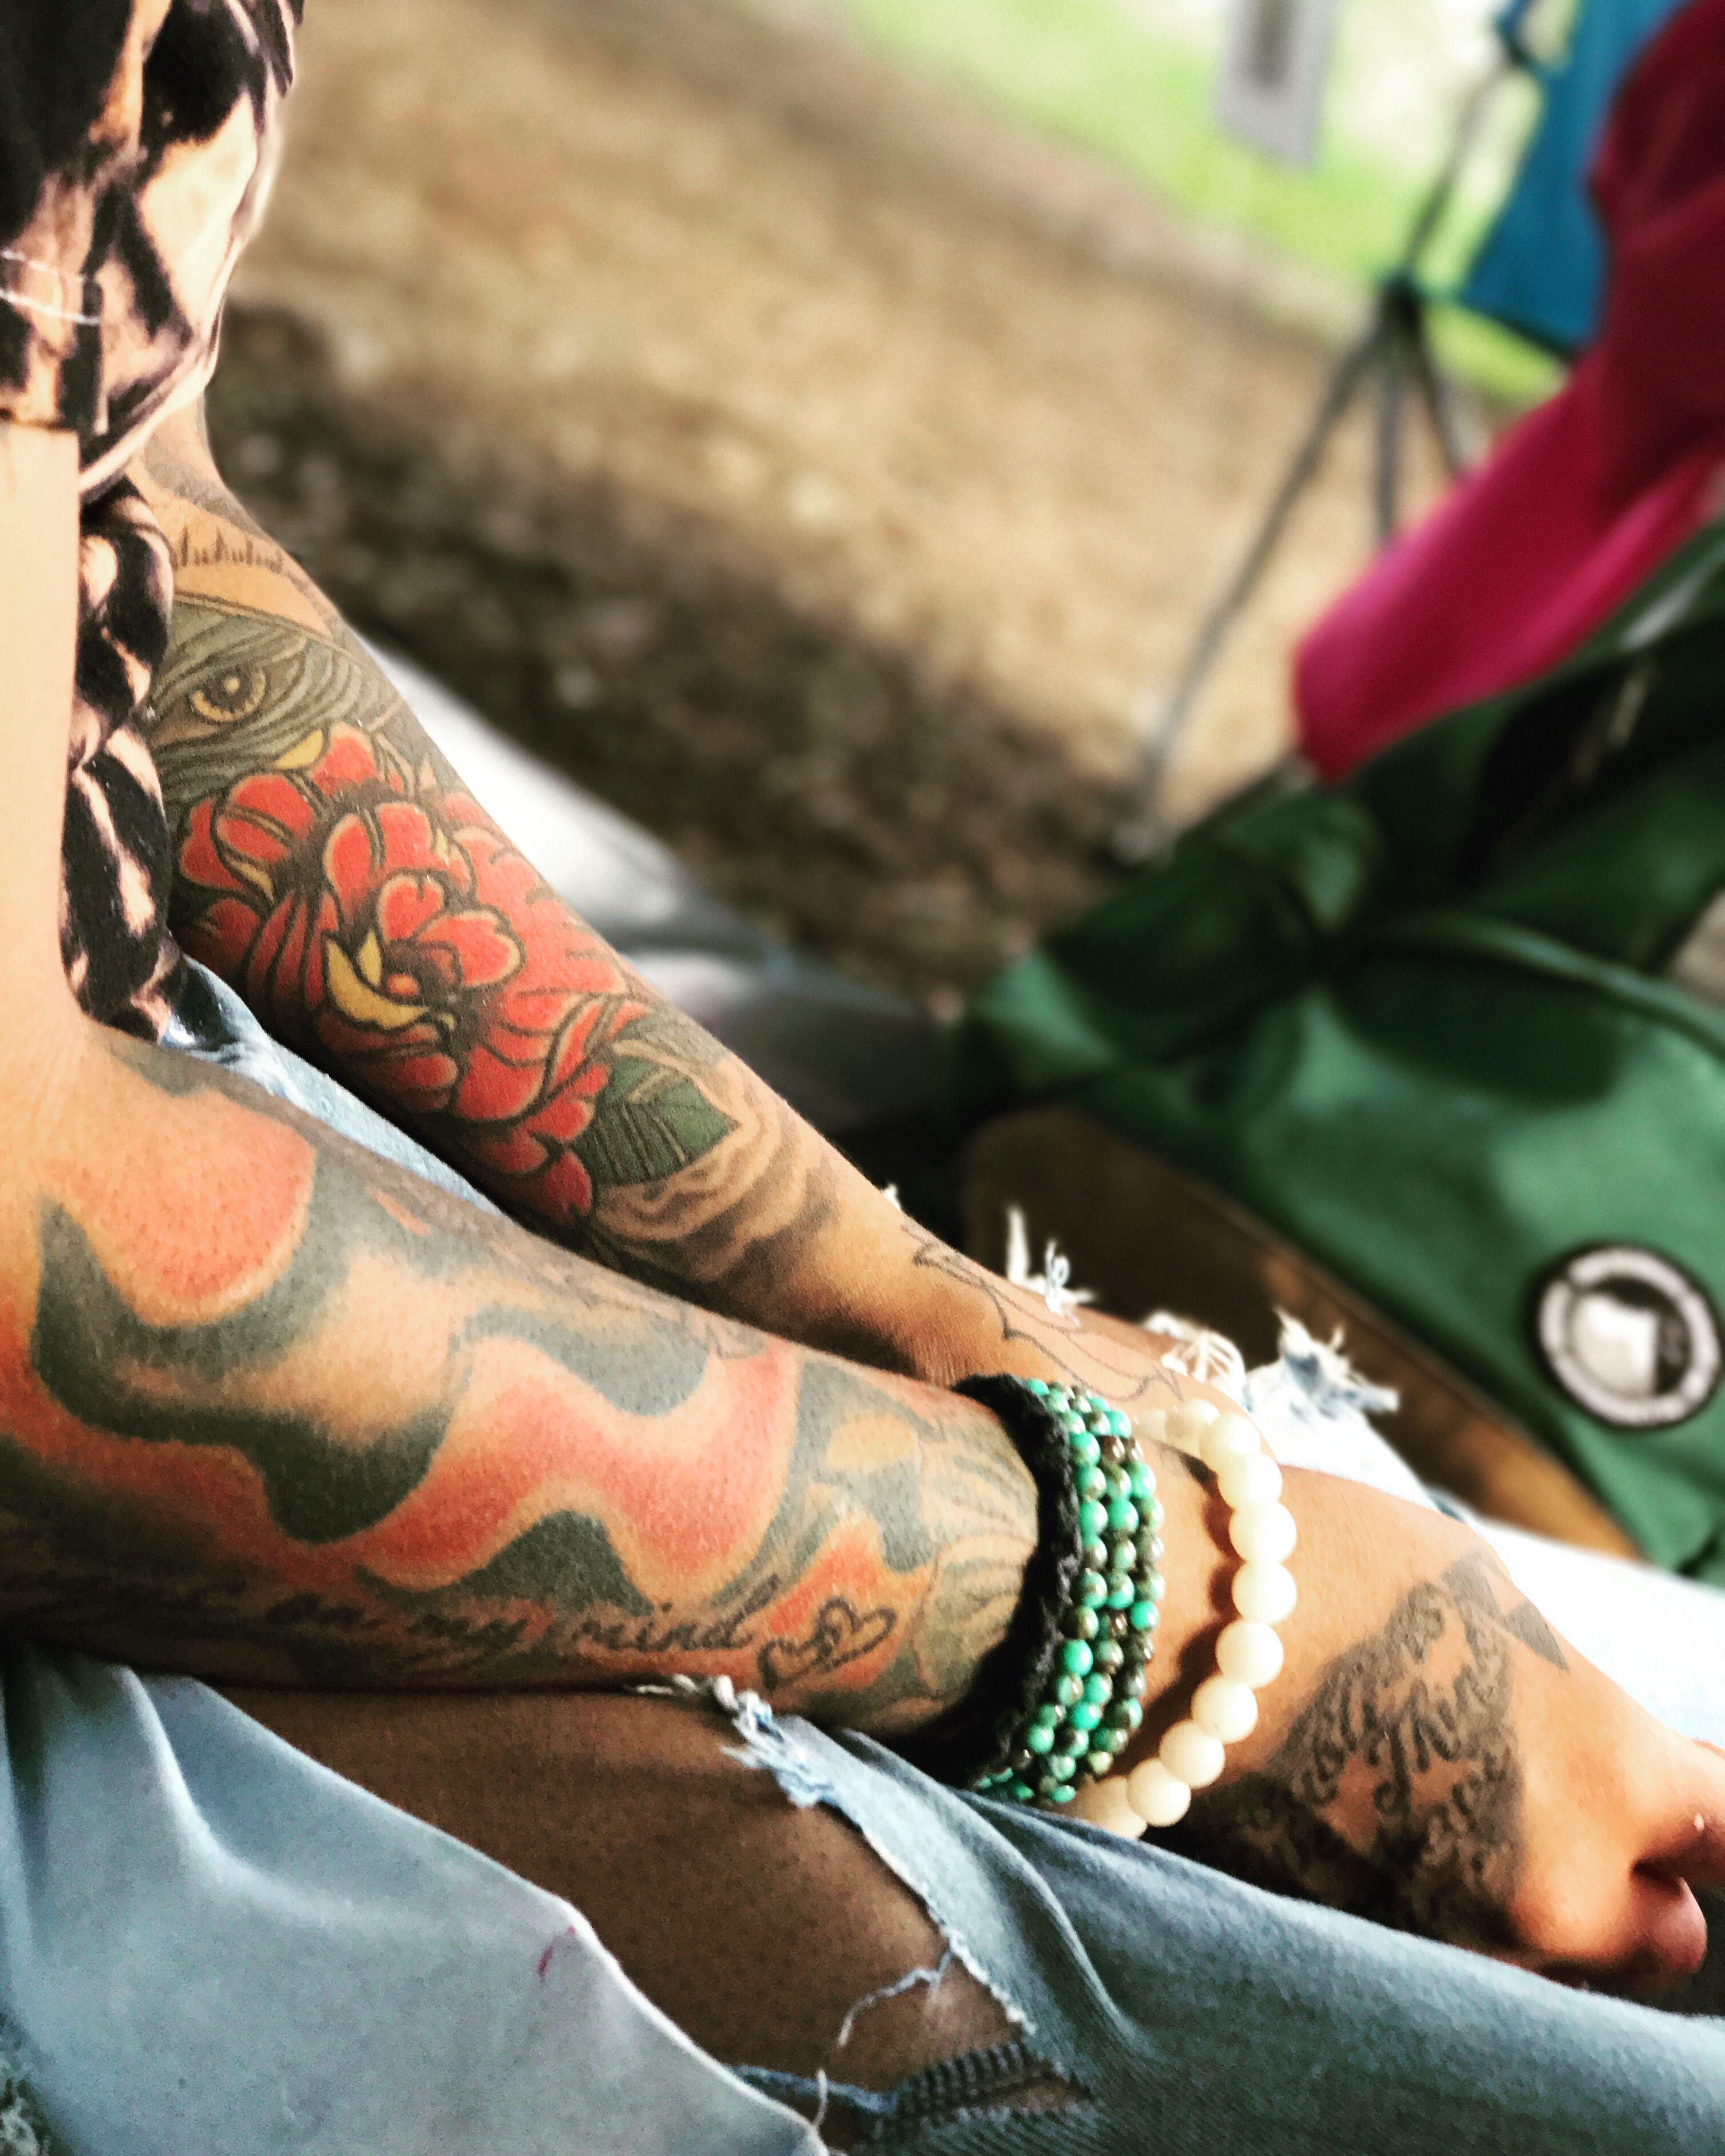 DOF Streetphotography My Tattoos Tattooslastlingetthanrelationships Art